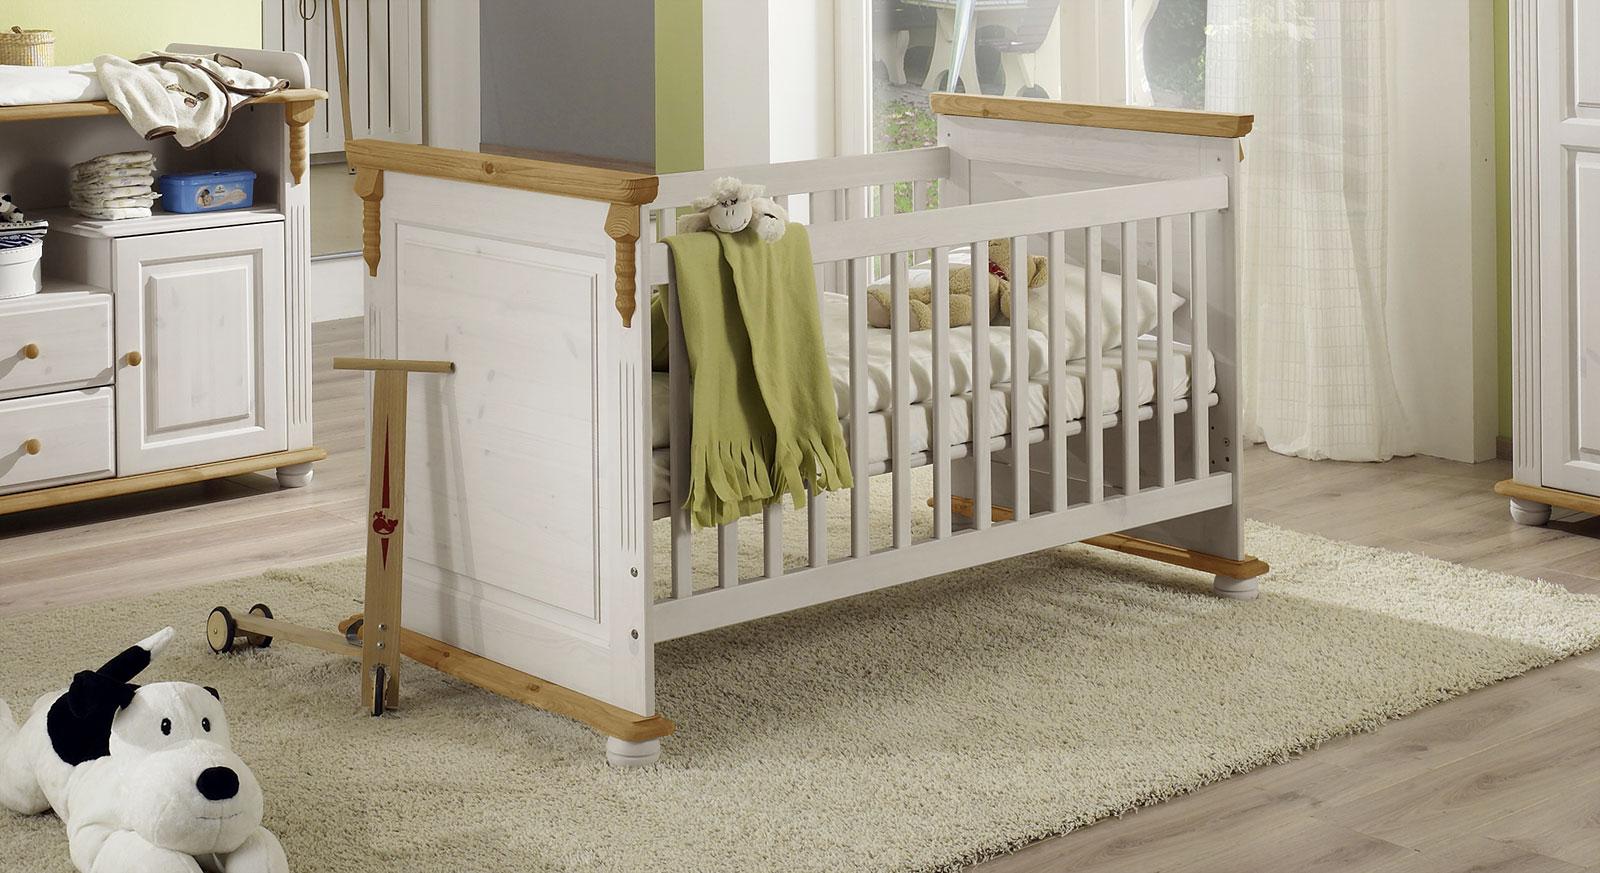 babybett im landhausstil 70x140 cm umbaubar countryside. Black Bedroom Furniture Sets. Home Design Ideas